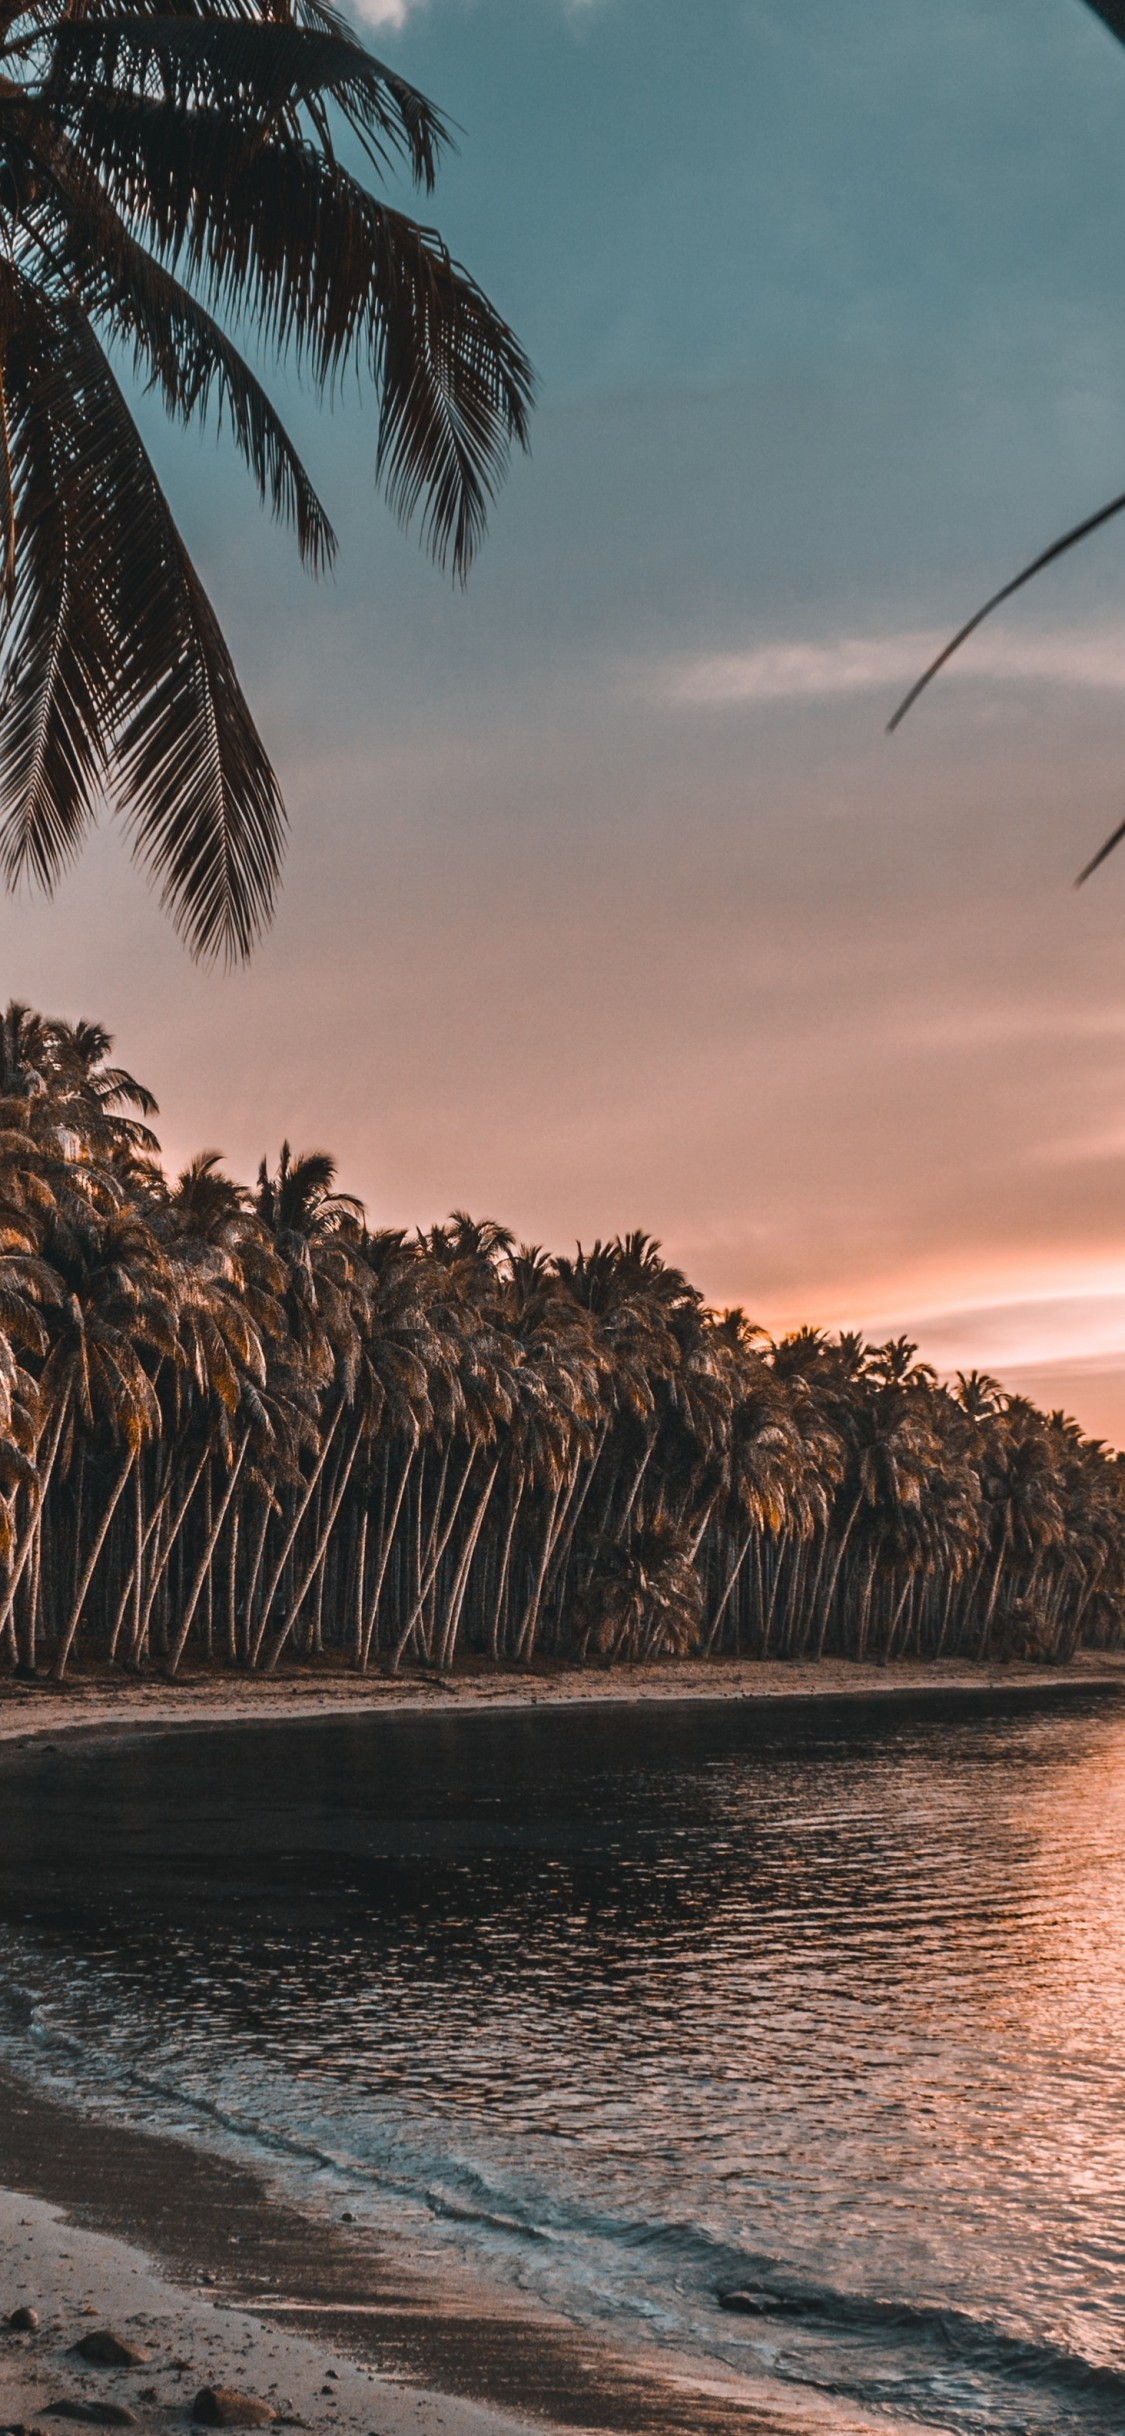 Palm Trees, Holiday, Island, Beach, Sunset - Palm Trees Wallpaper Beach Sunset - HD Wallpaper